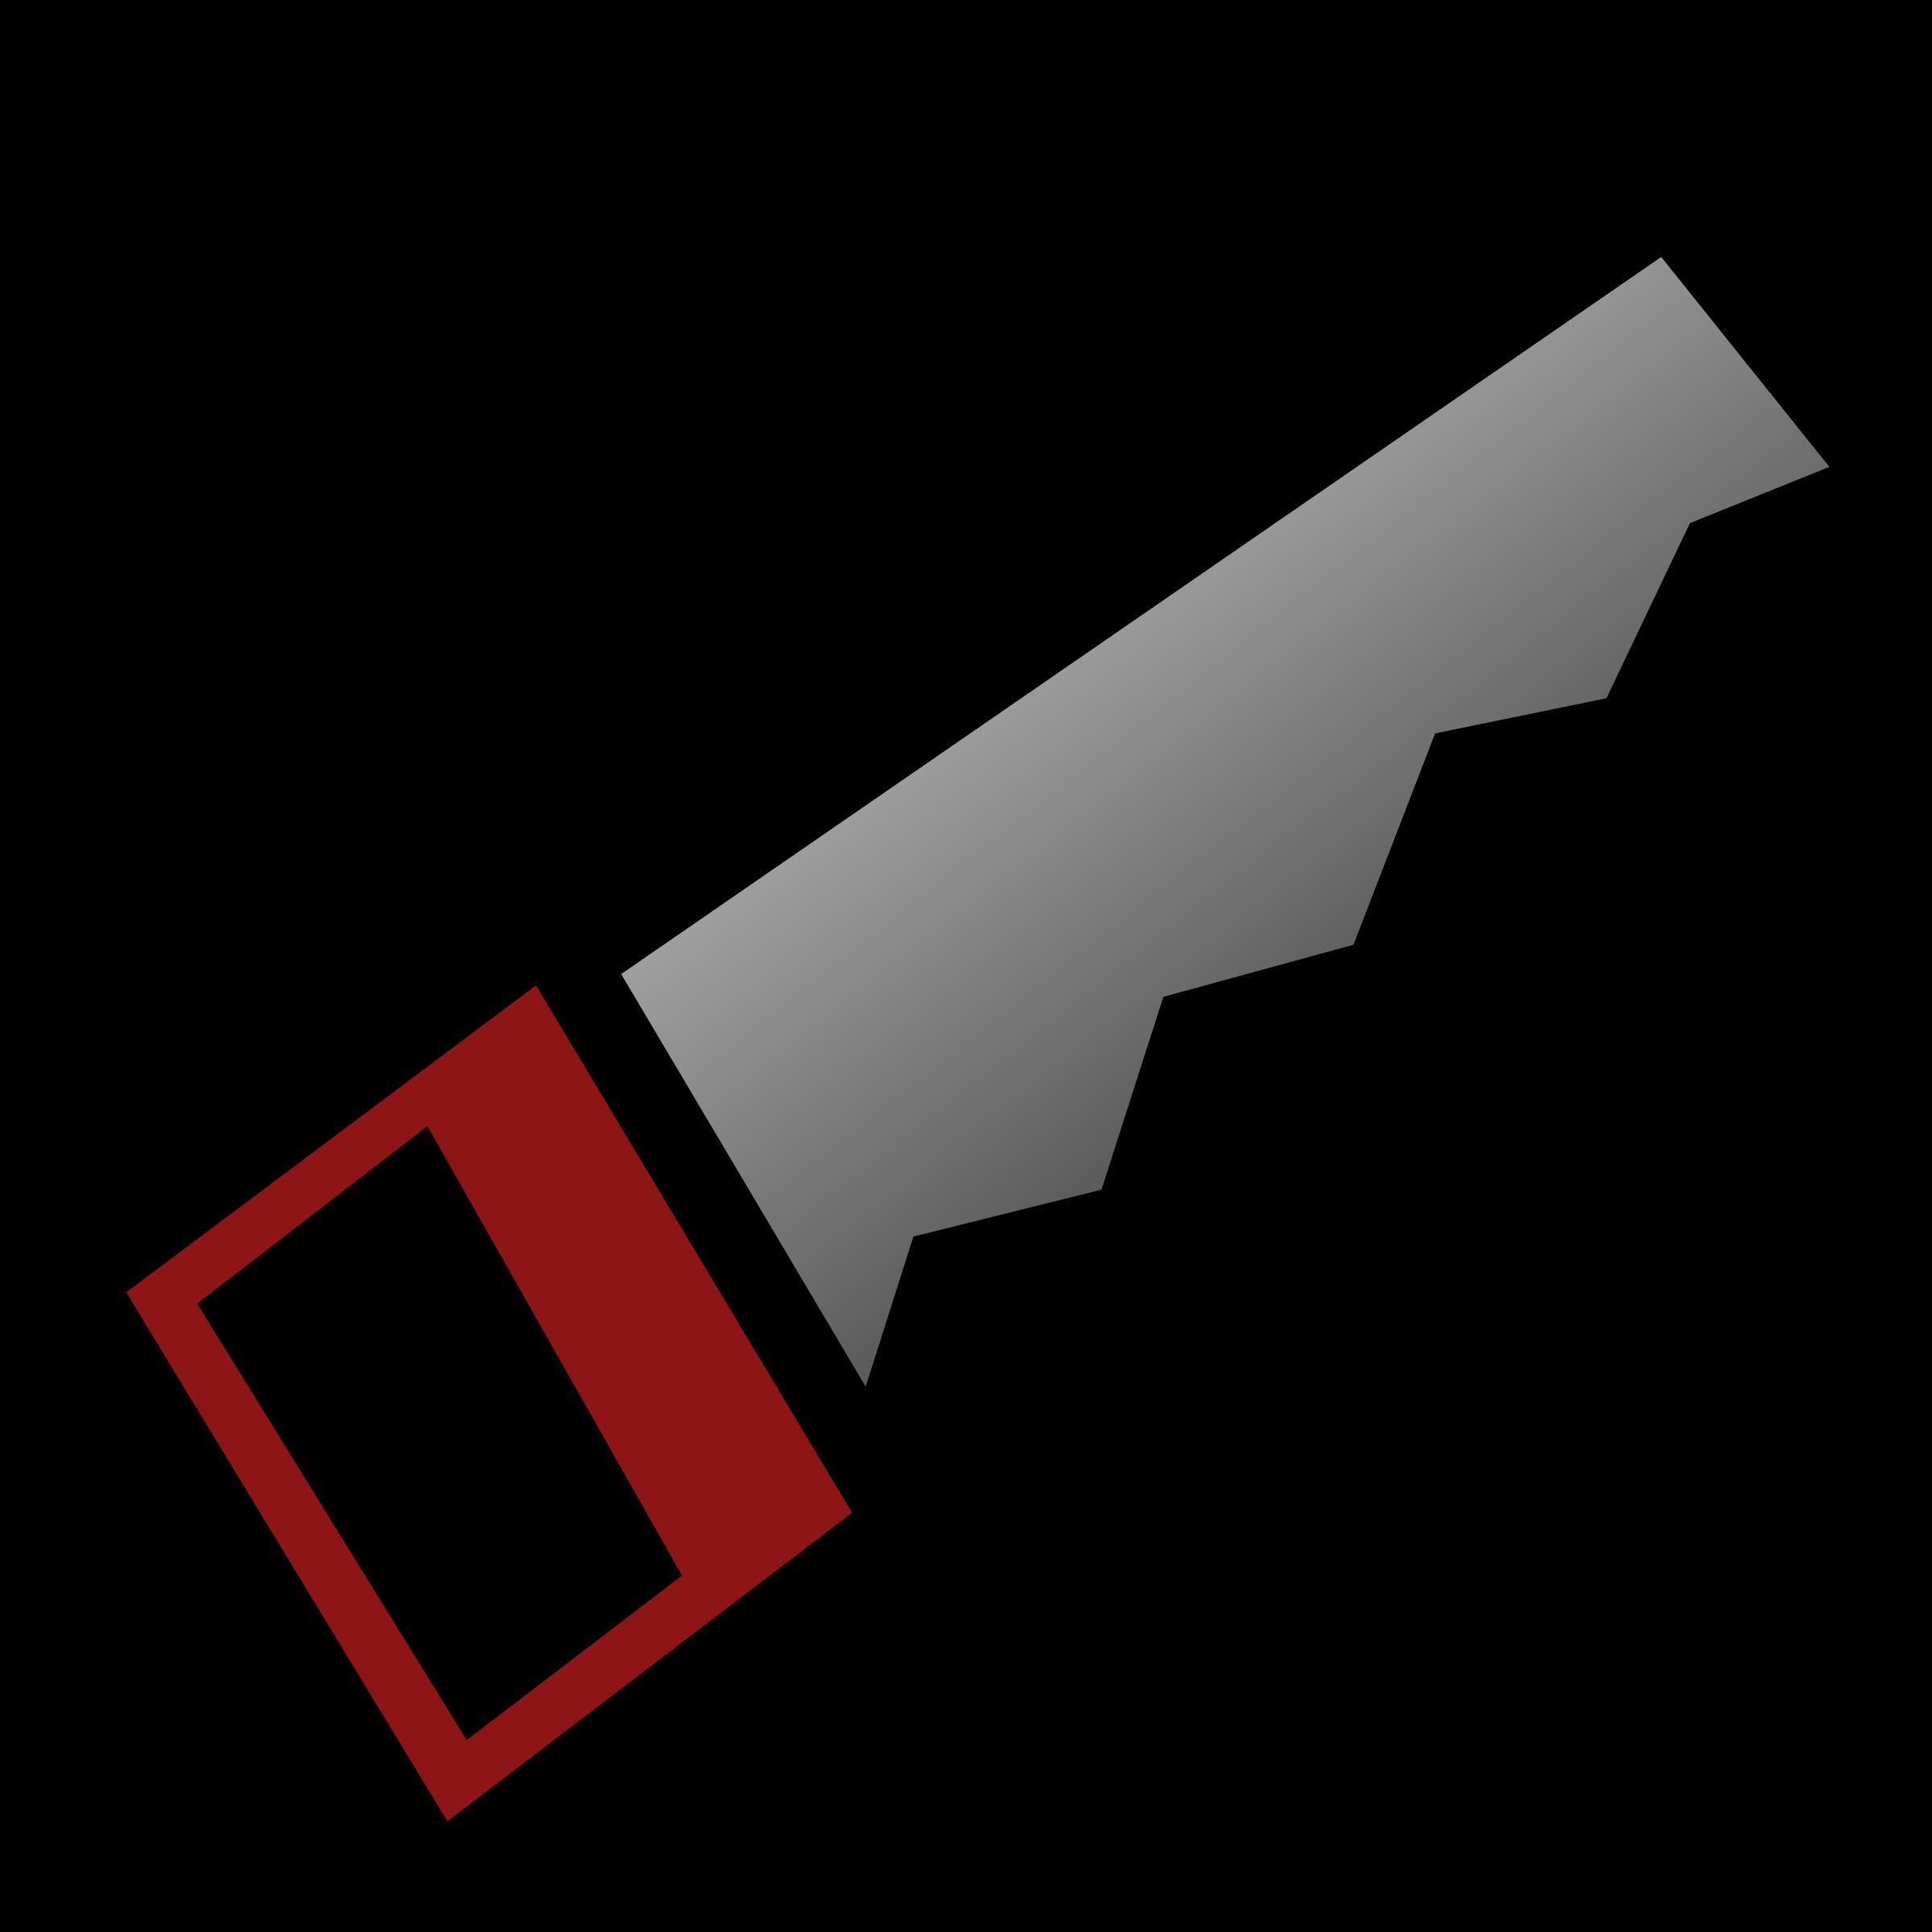 Clip Art Saw - ClipArt Best